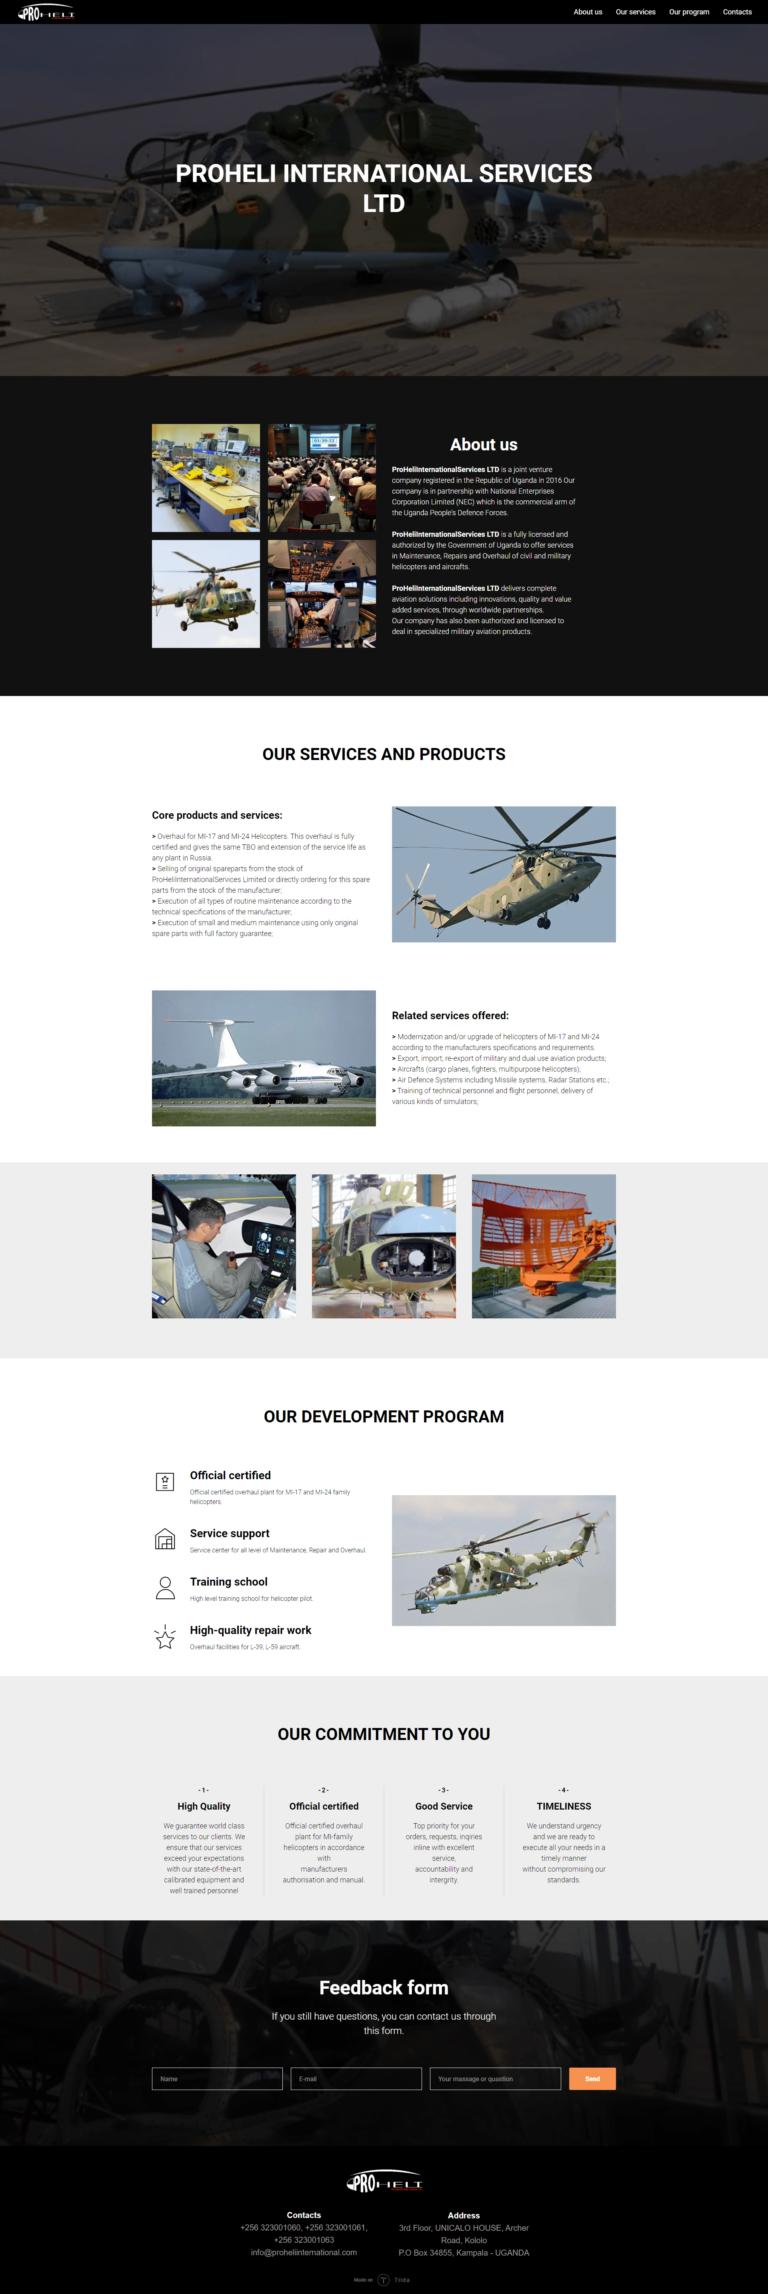 Корпоративный сайт компании ProHeli